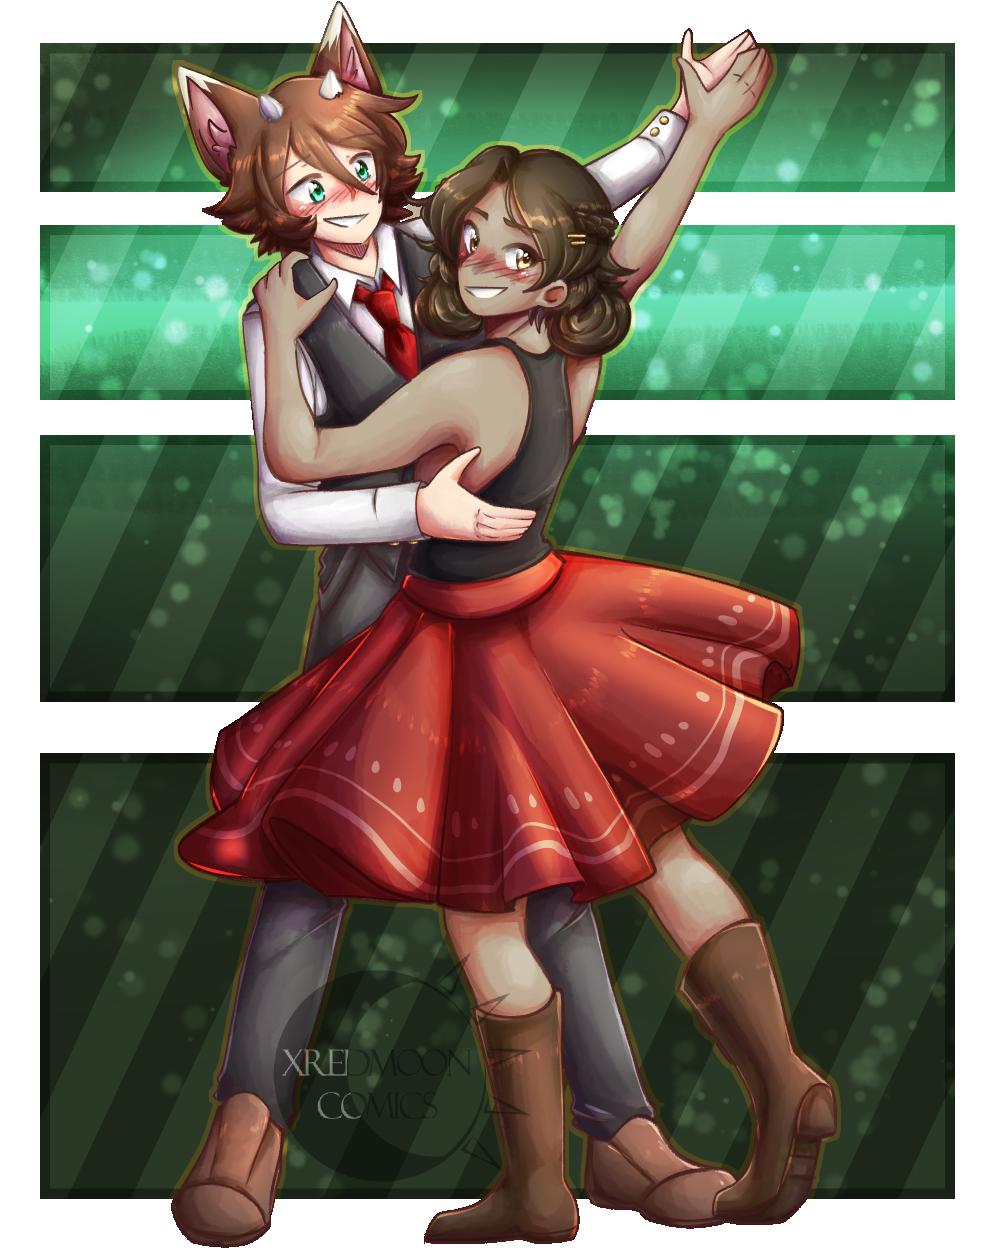 [Present] Shall We Dance?